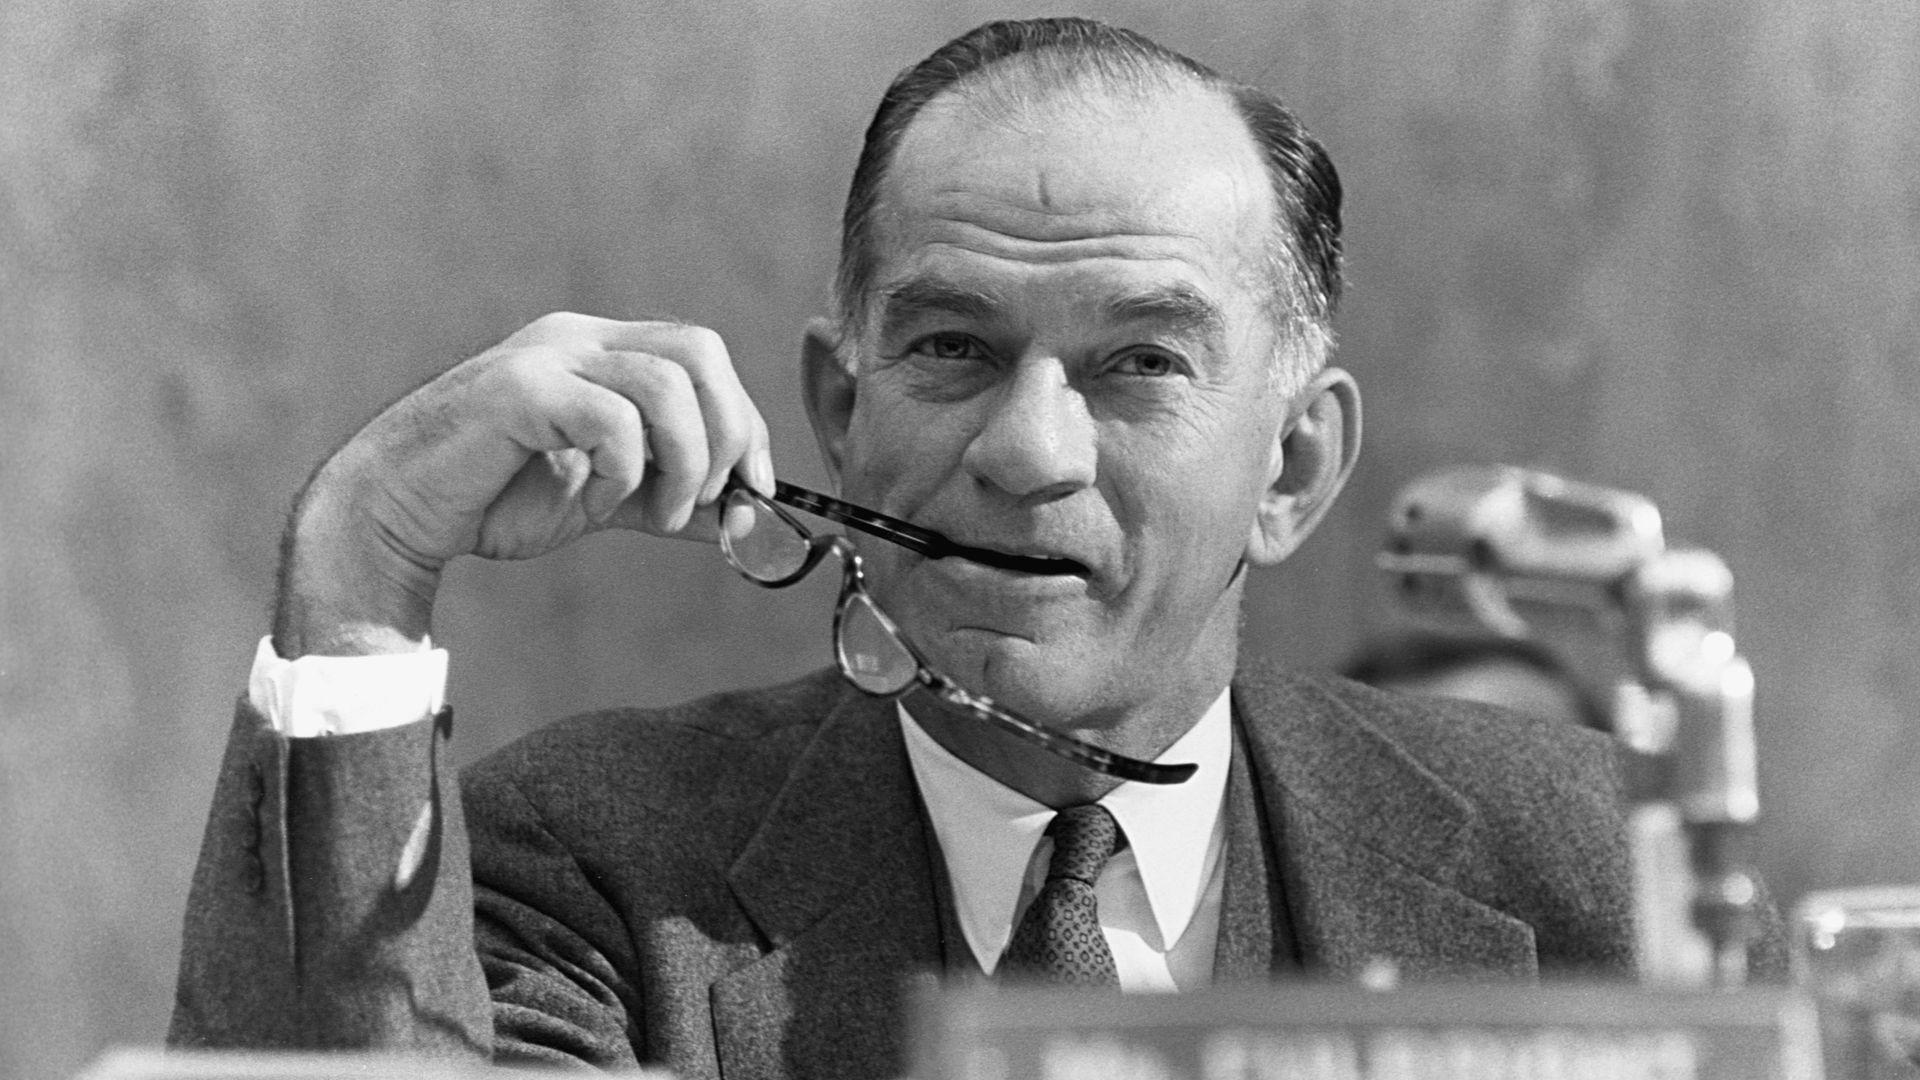 James William Fulbright was a democratic U.S. Senator from 1945 to 1974.